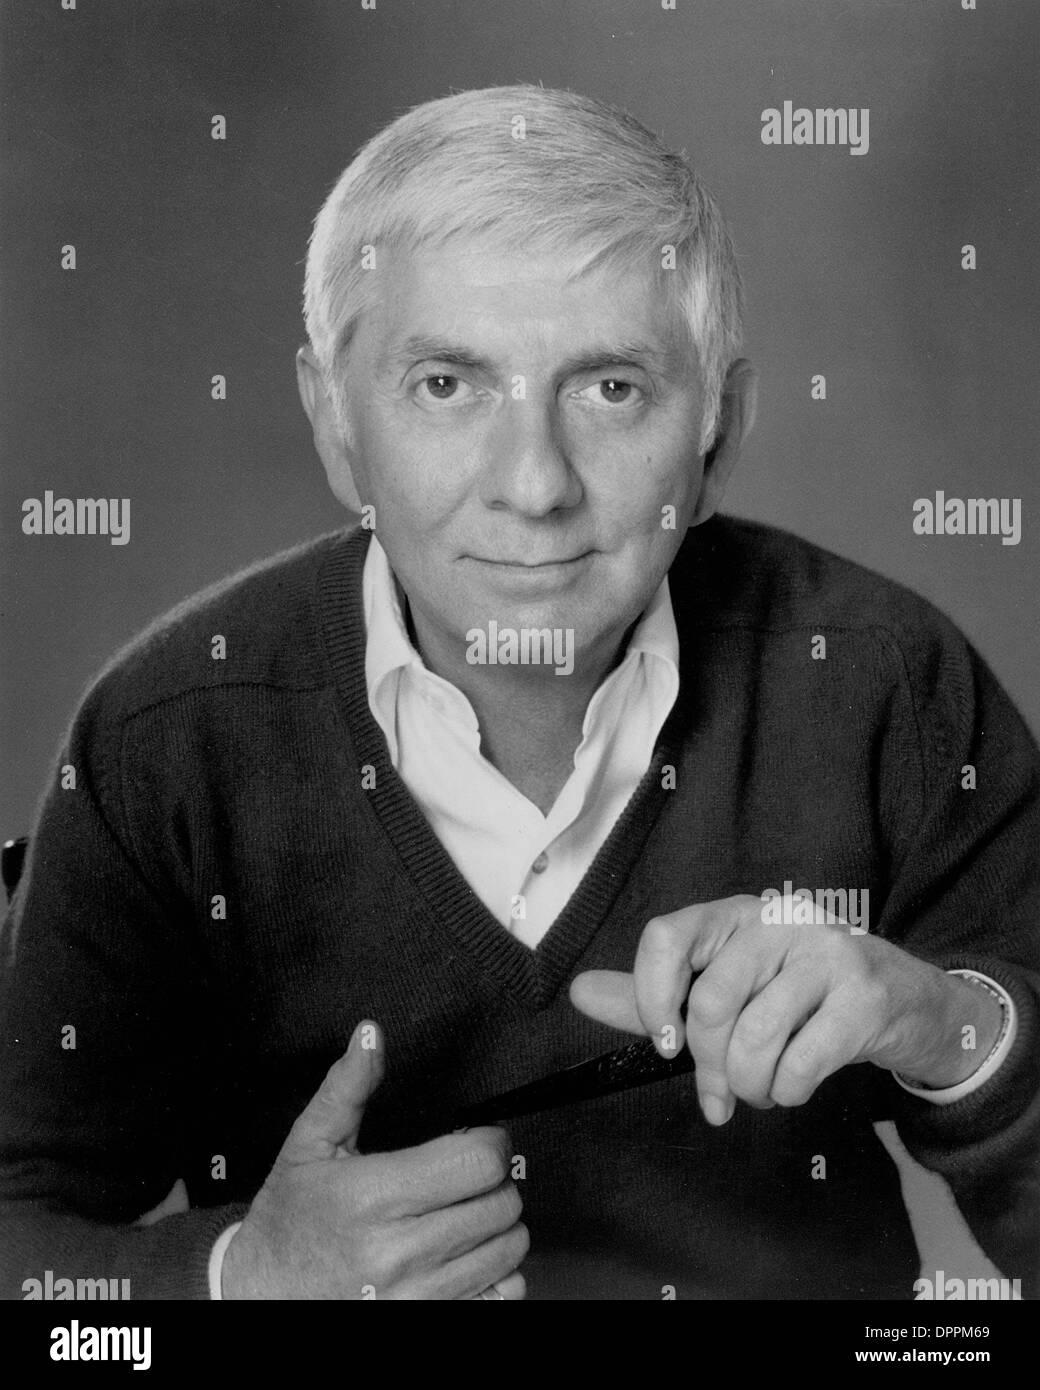 June 26, 2006 - AARON SPELLING.SUPPLIED BY    TV-FILM-STILL(Credit Image: © Globe Photos/ZUMAPRESS.com) - Stock Image